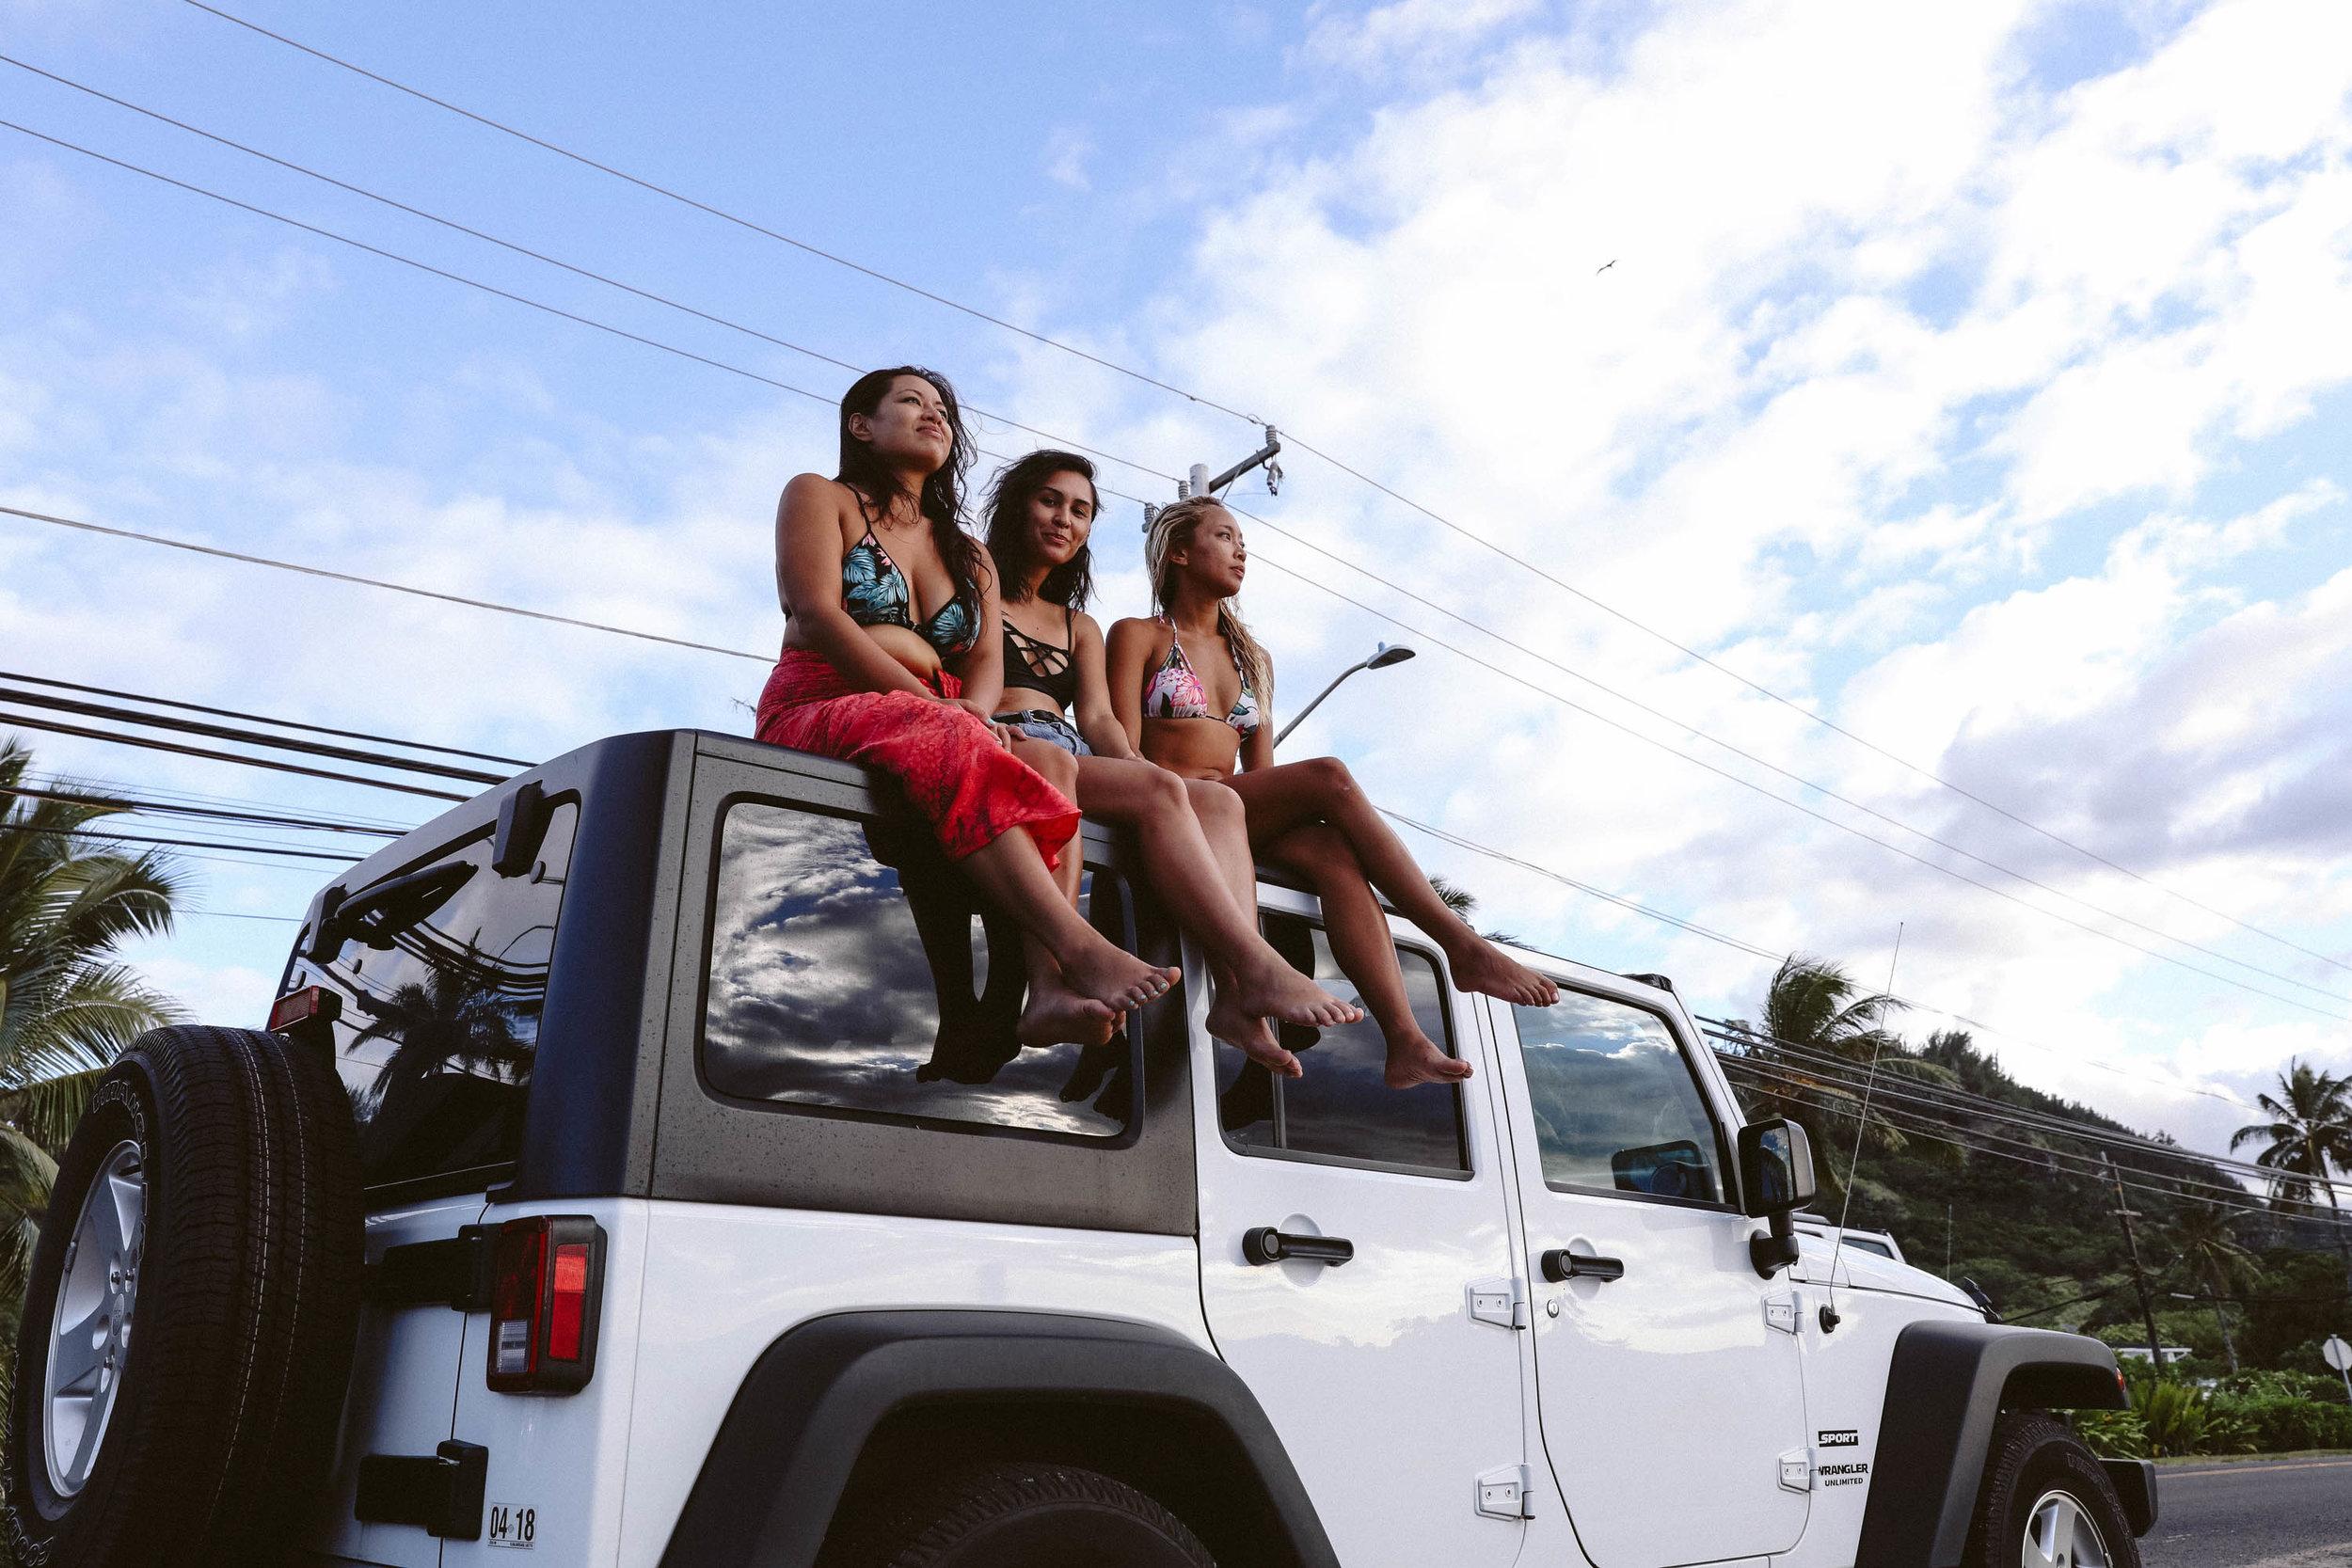 090117-Oahu-DayFour-54.jpg